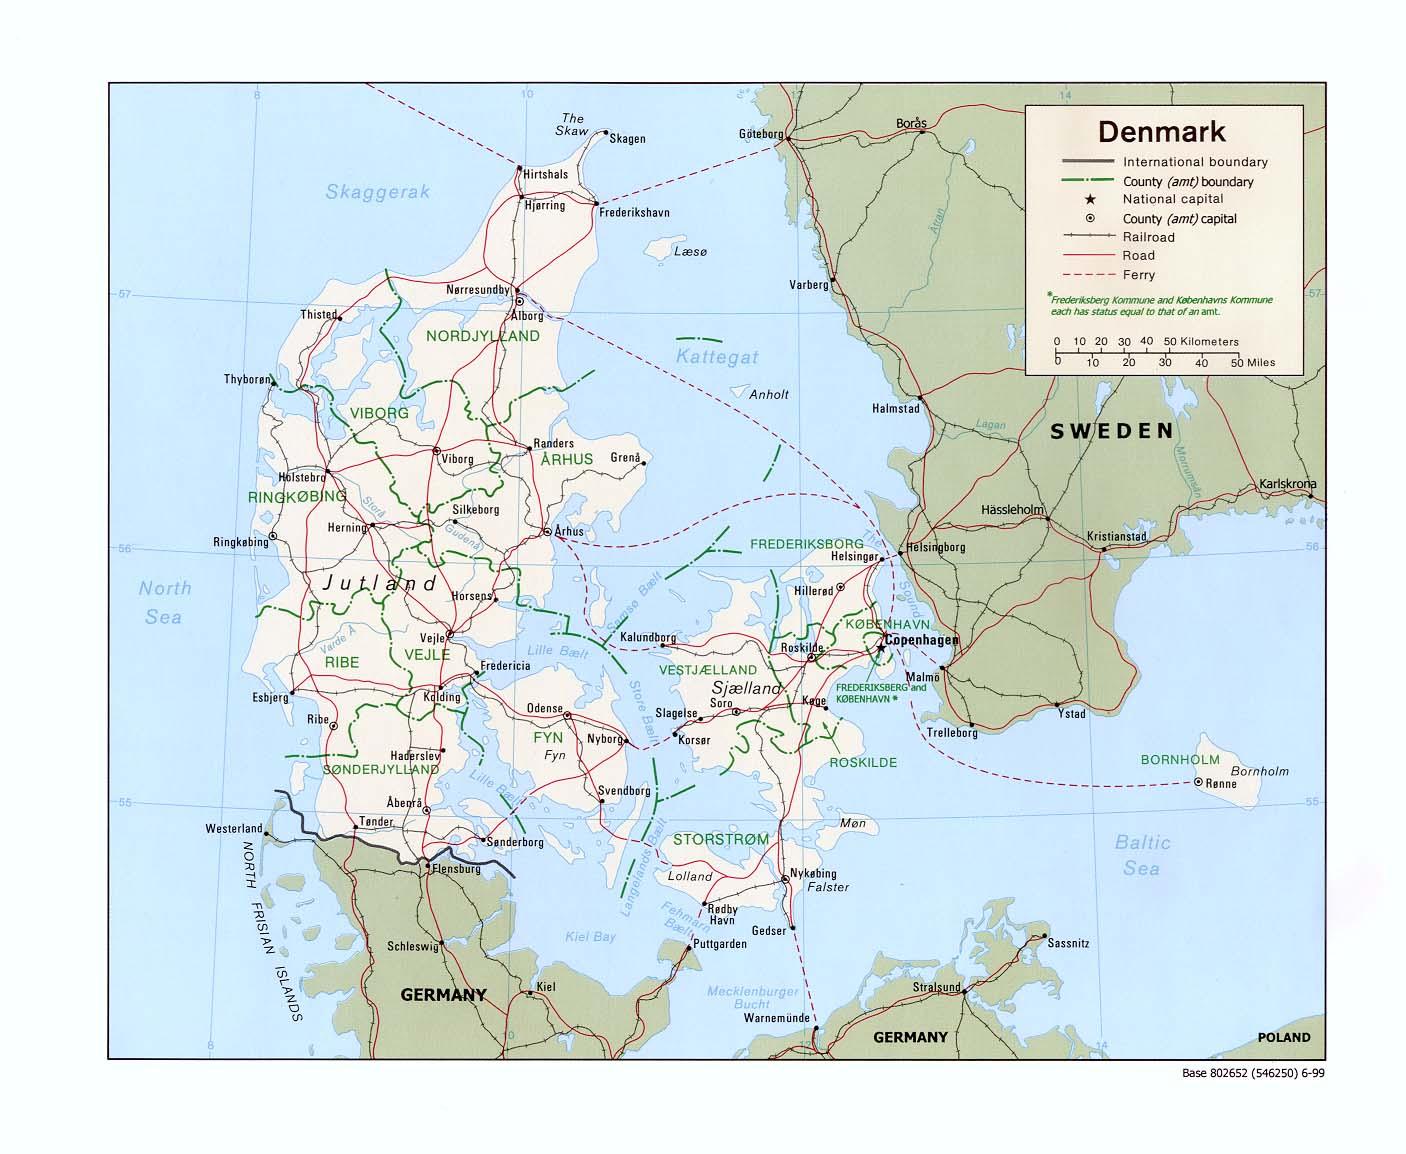 Map of Denmark (Political Map) : Weltkarte.com - Karten und ...